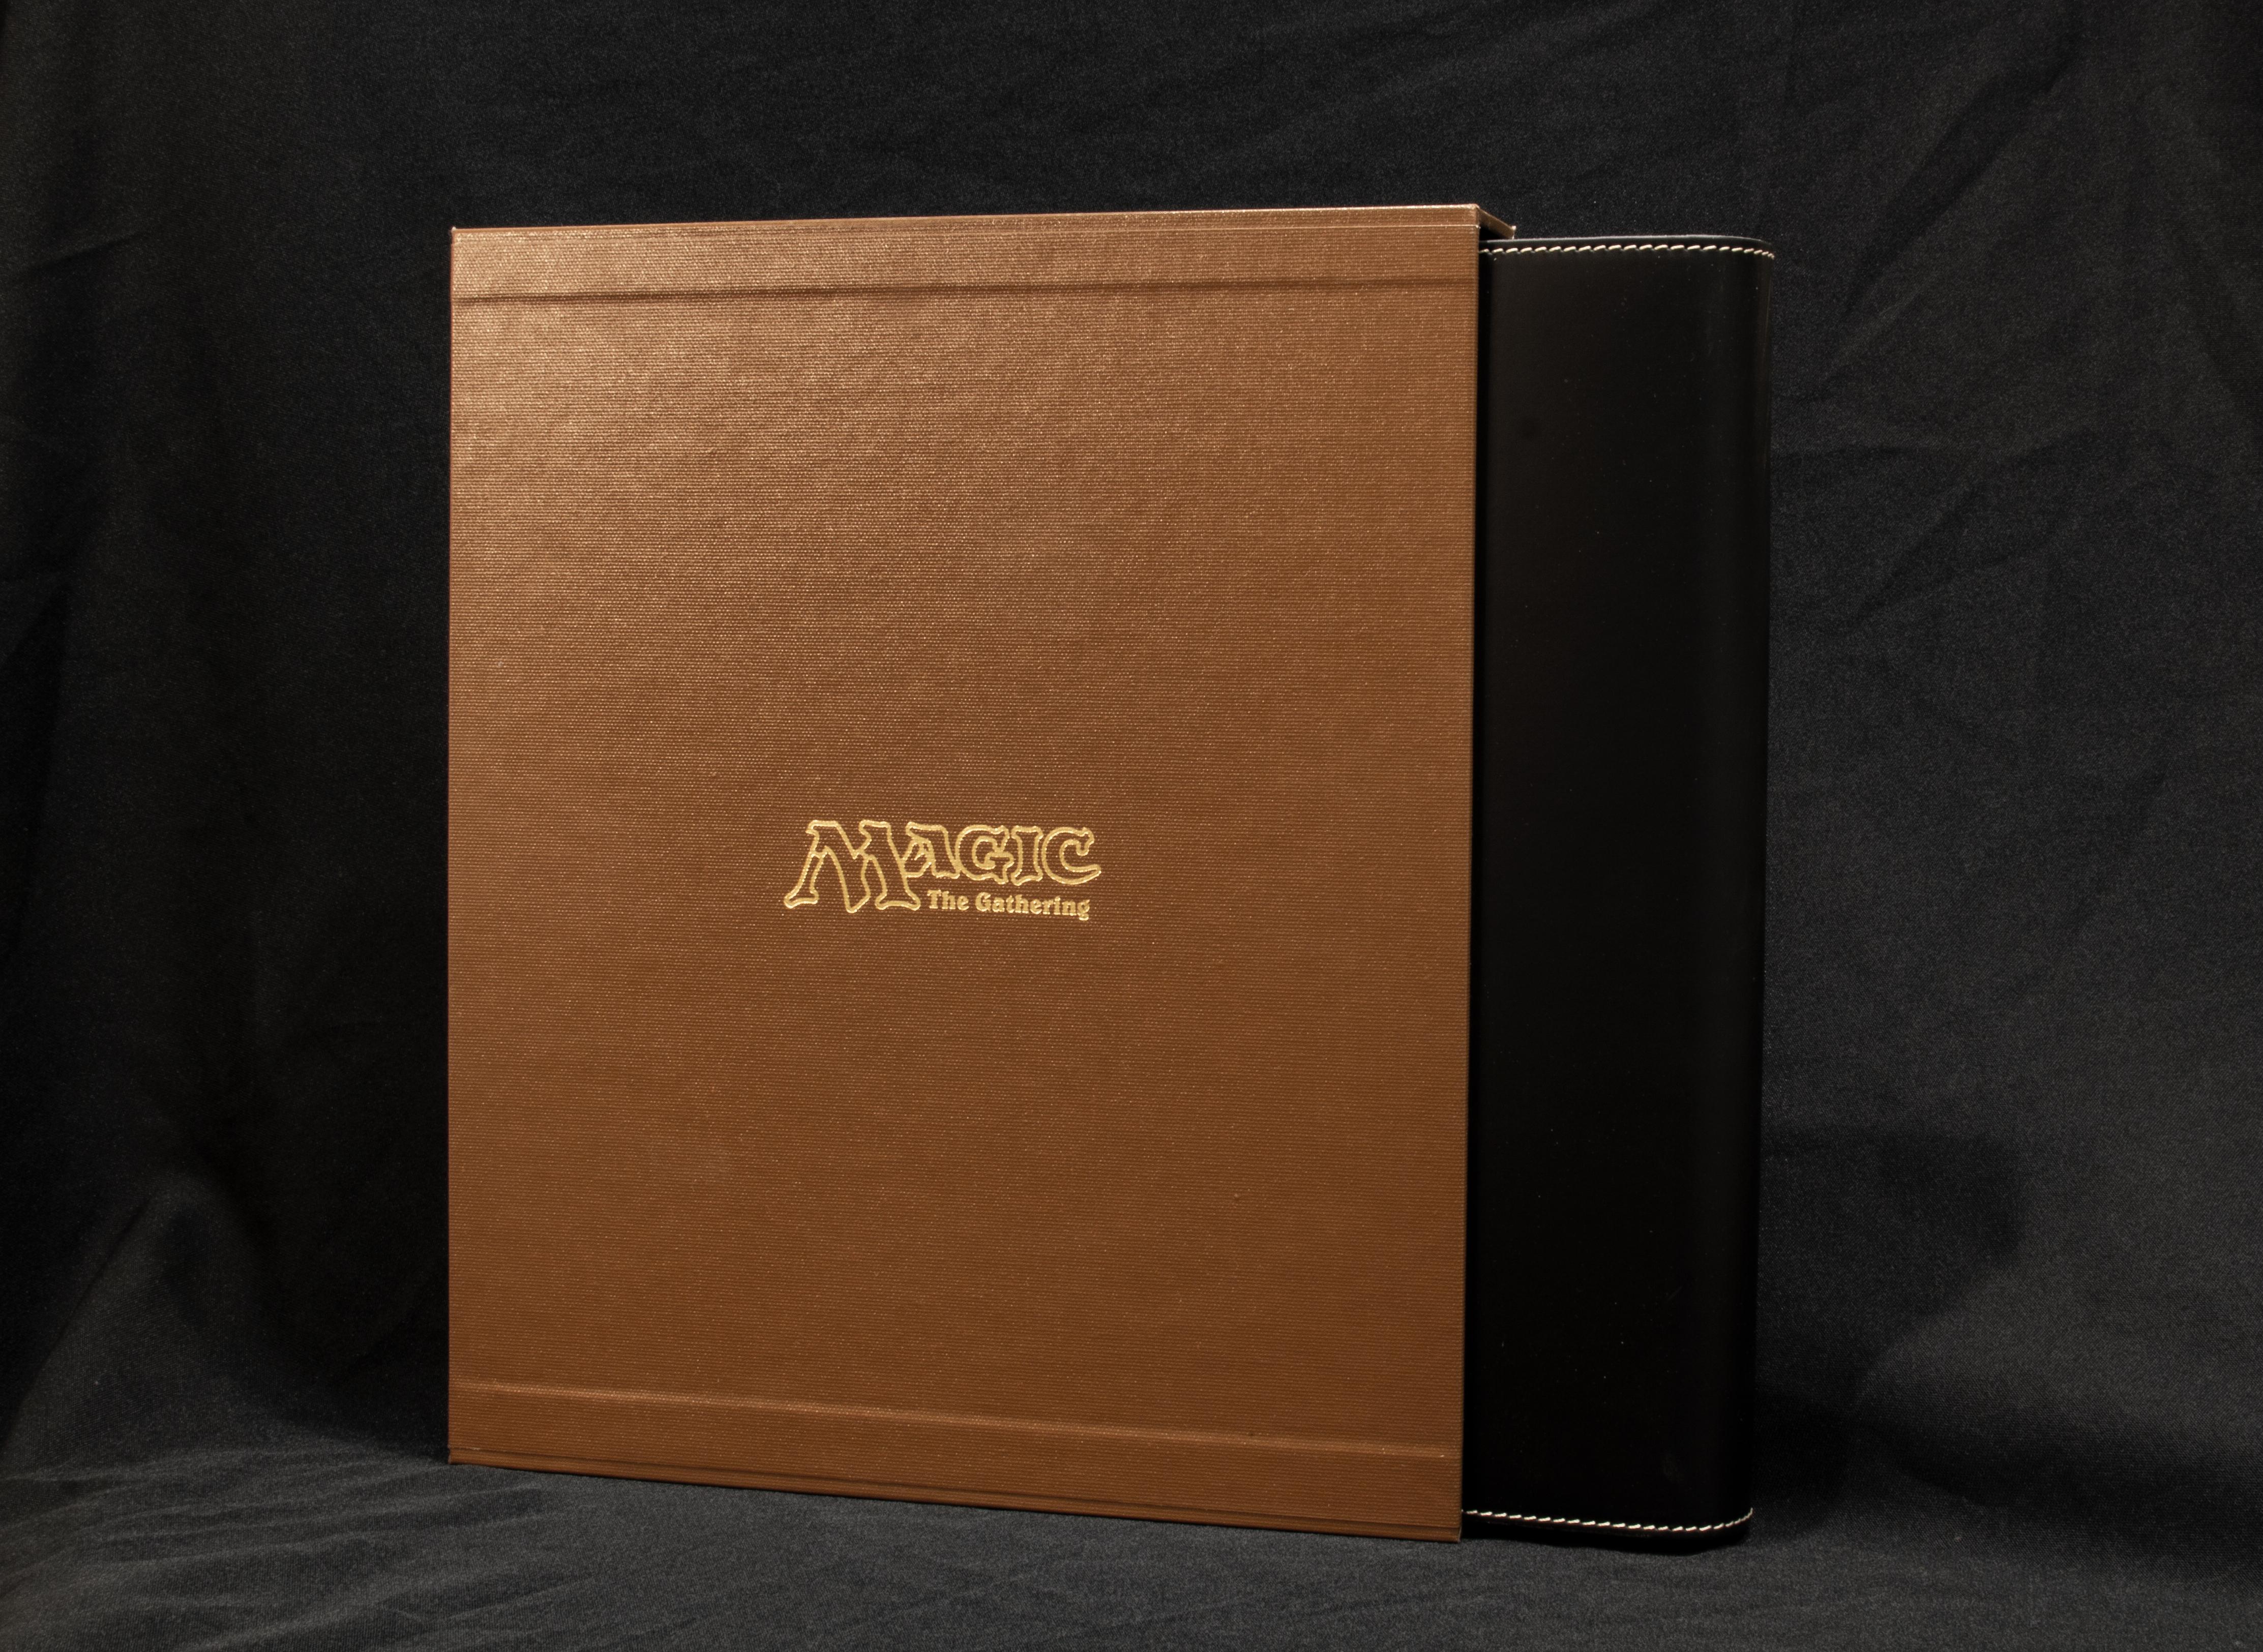 Slipcase and Black option binder